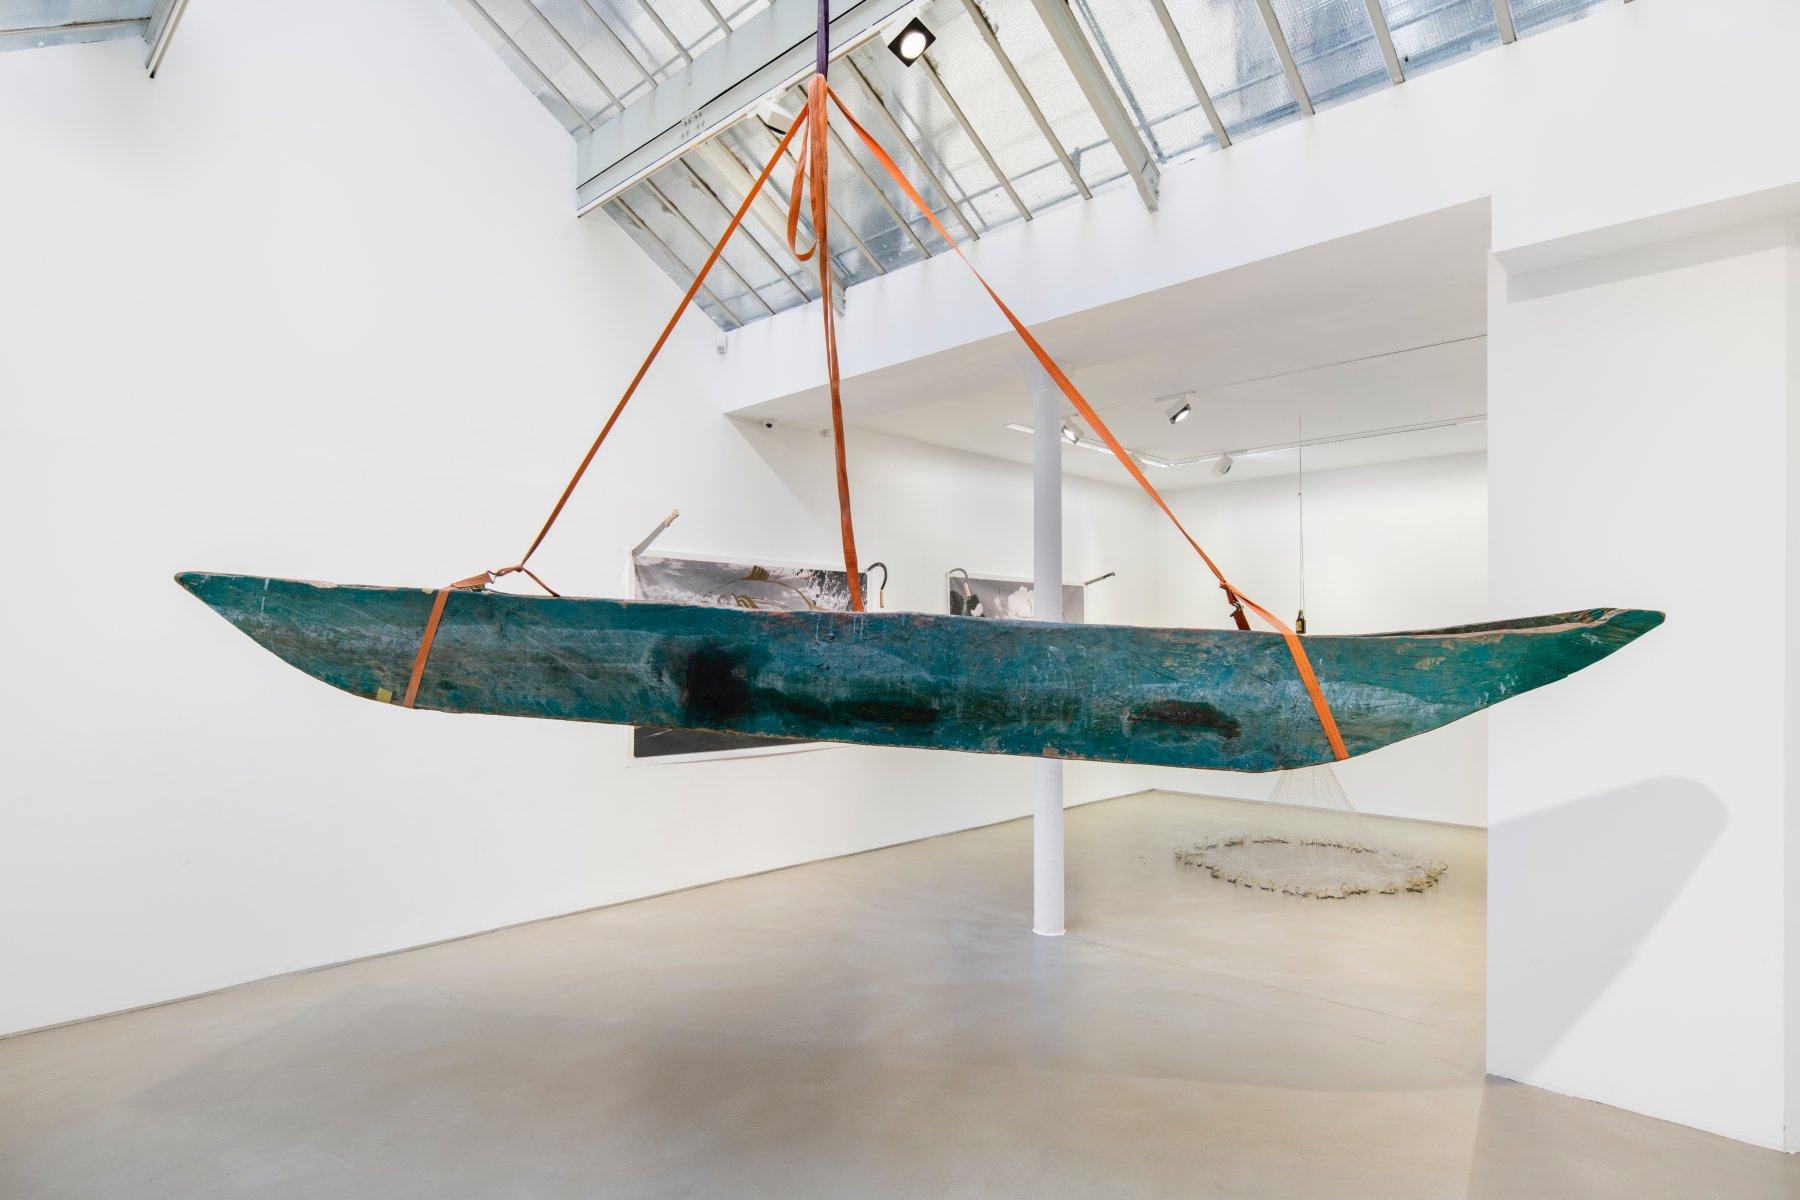 Galerie Chantal Crousel Rhe 1